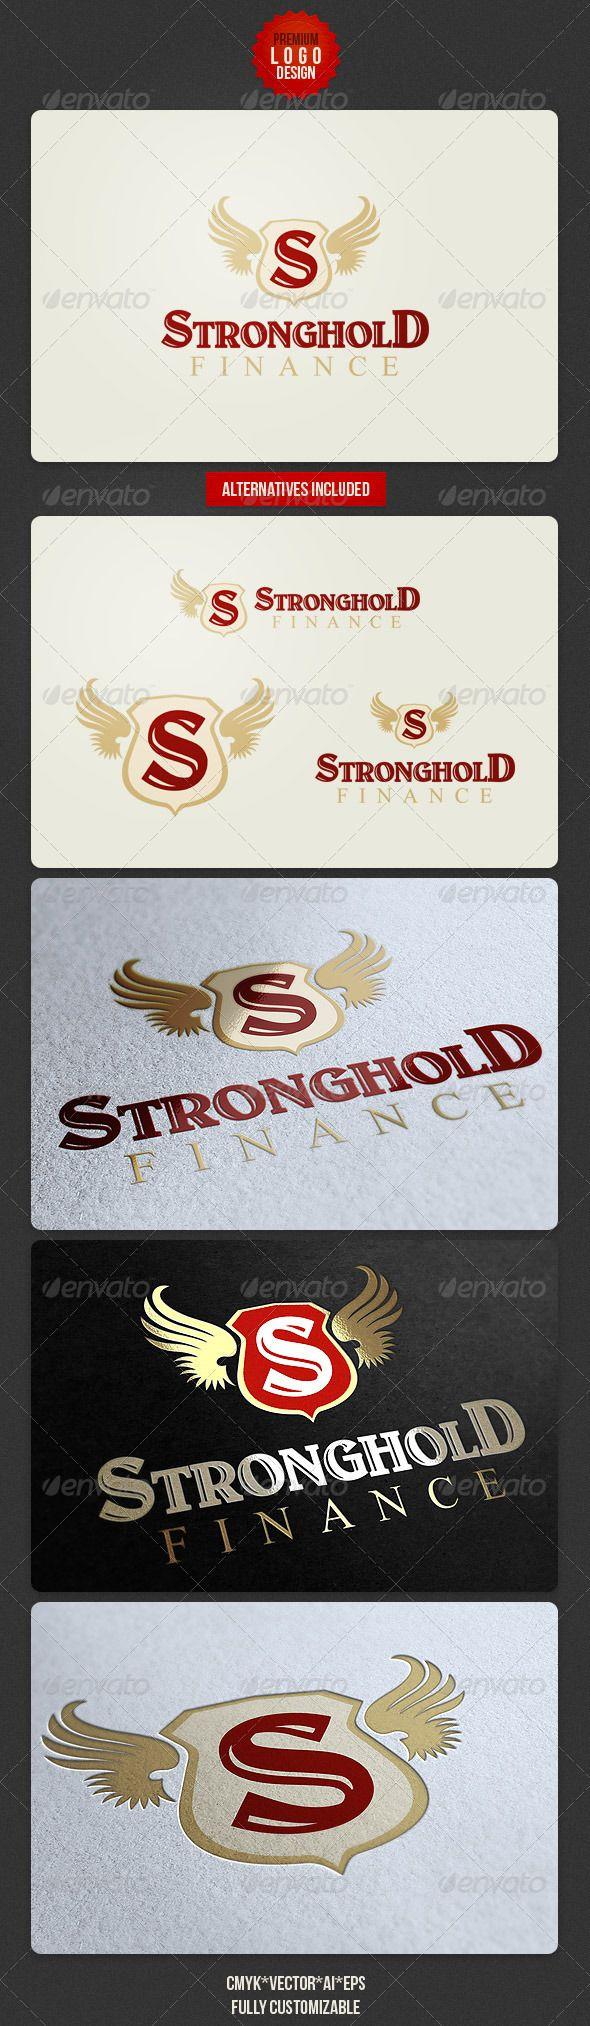 Finance Retro Logo Design